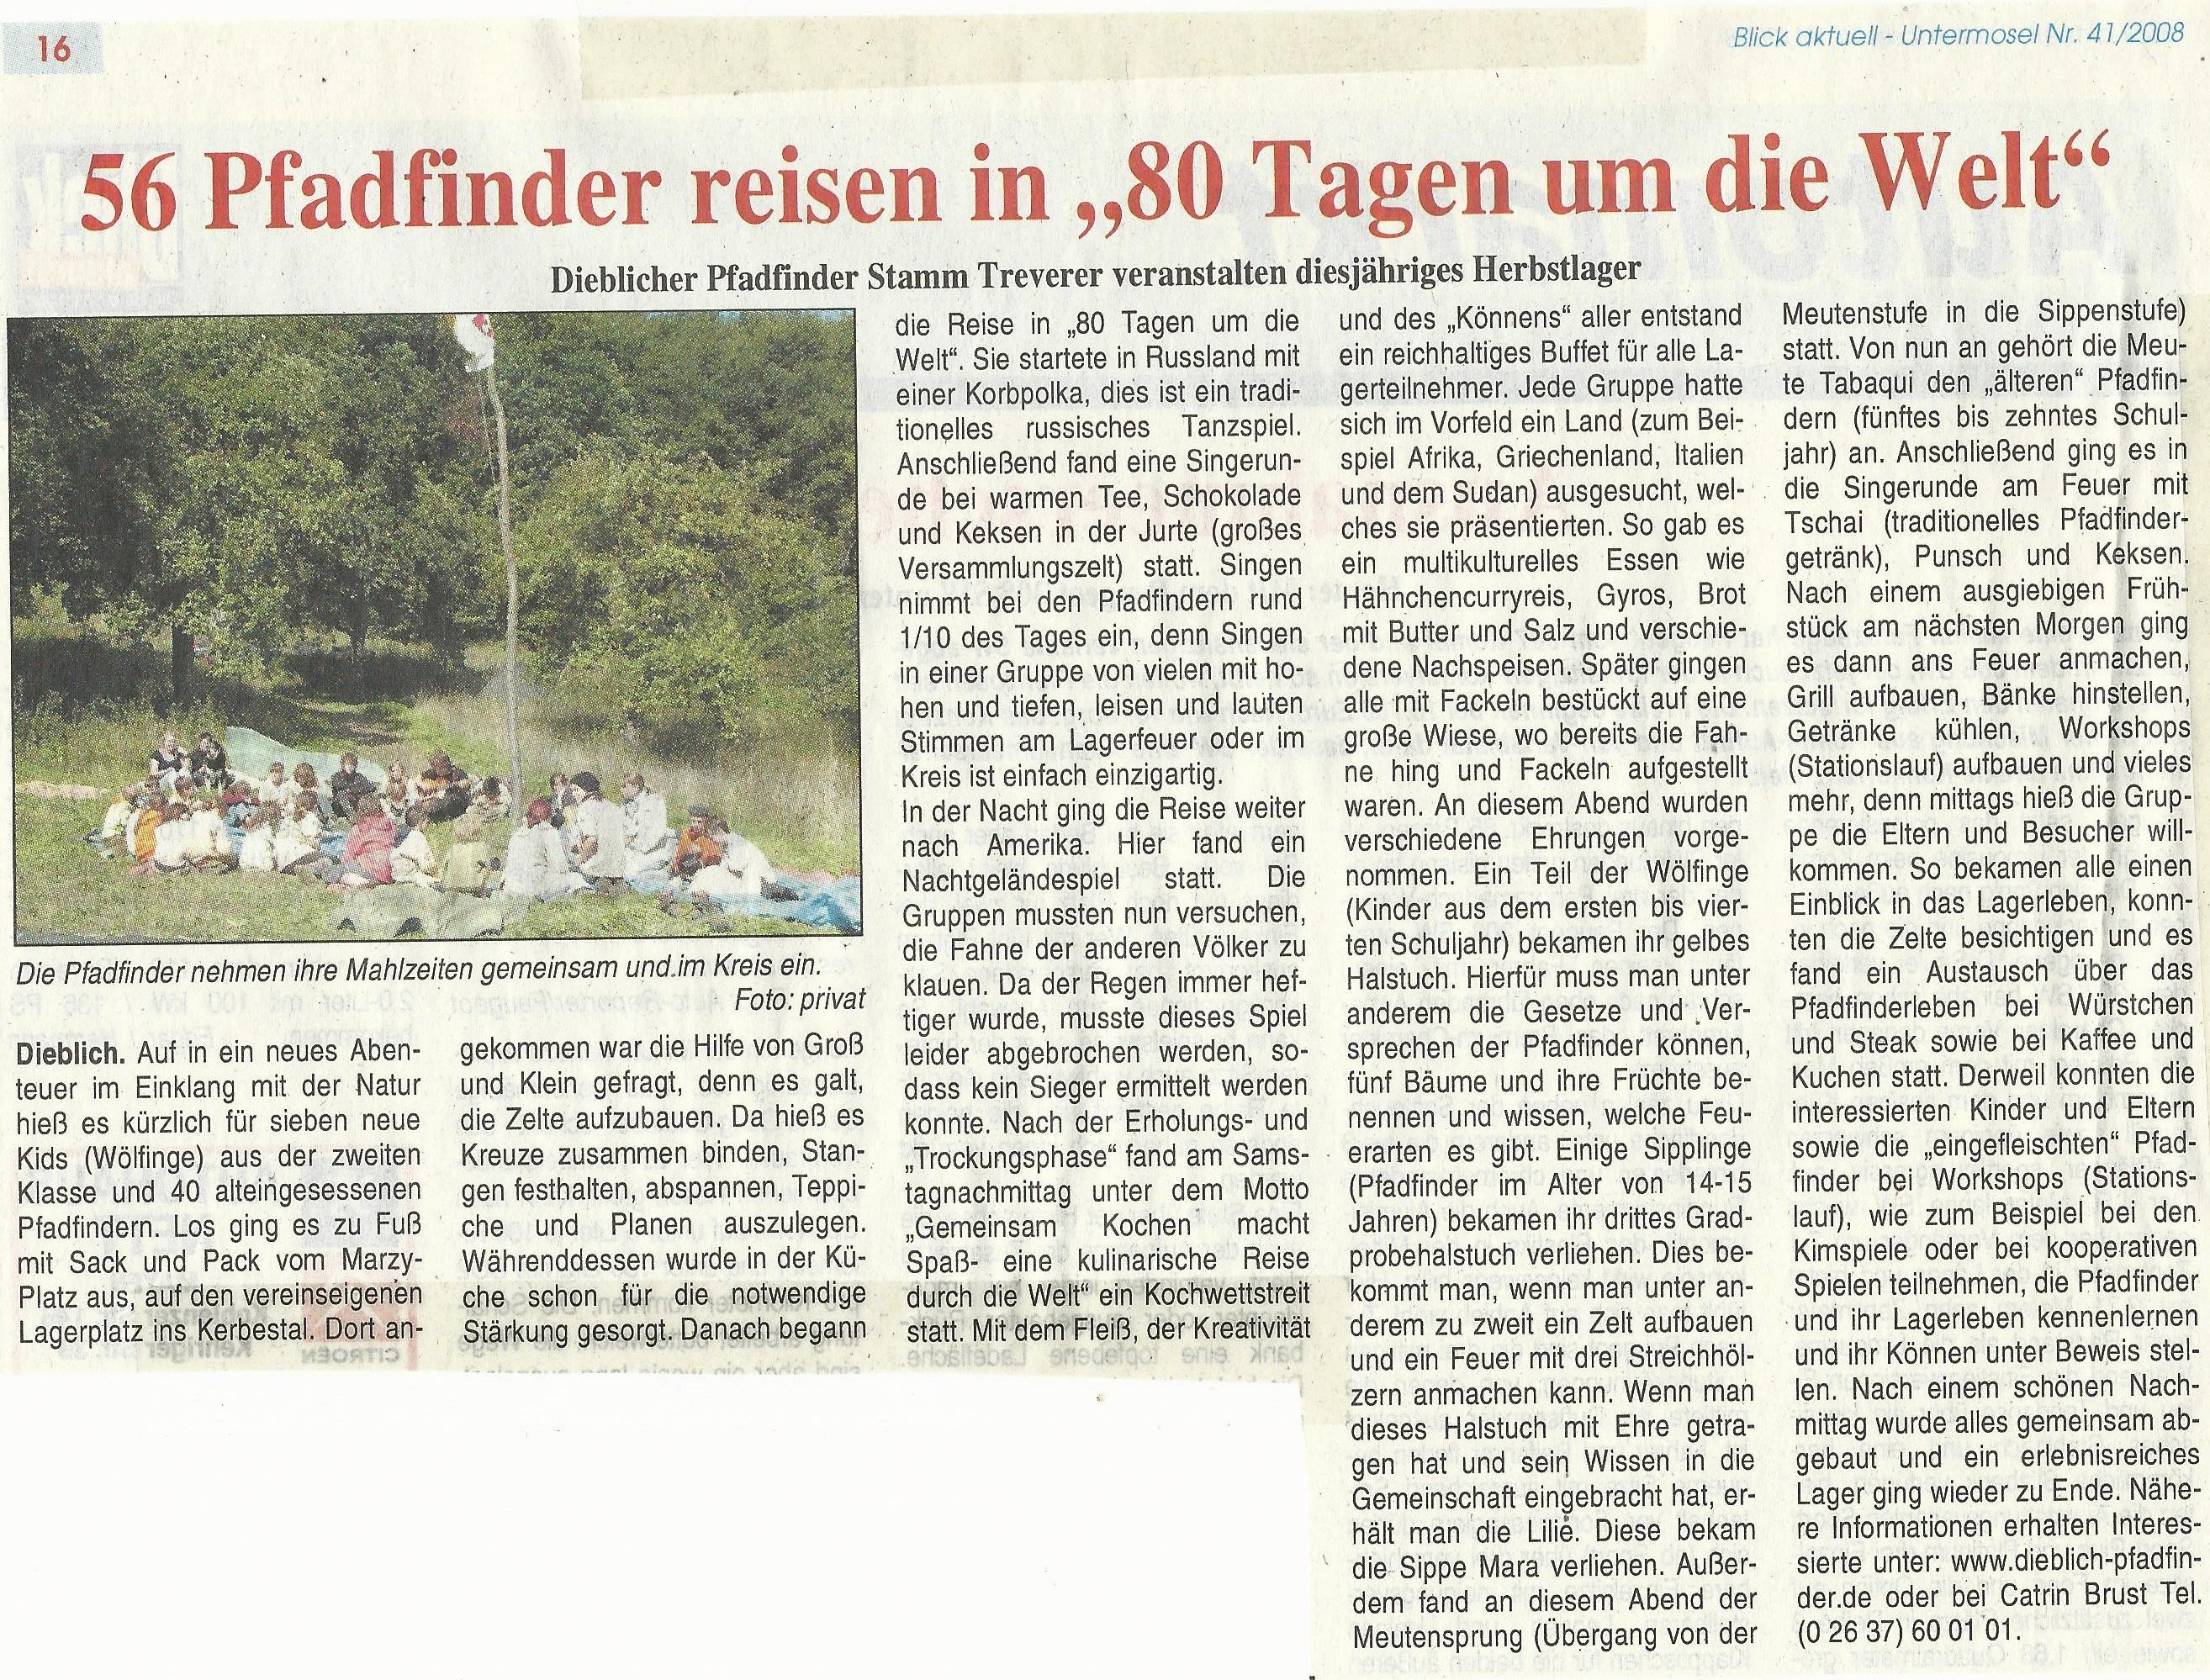 Pressebericht HeLa 2008